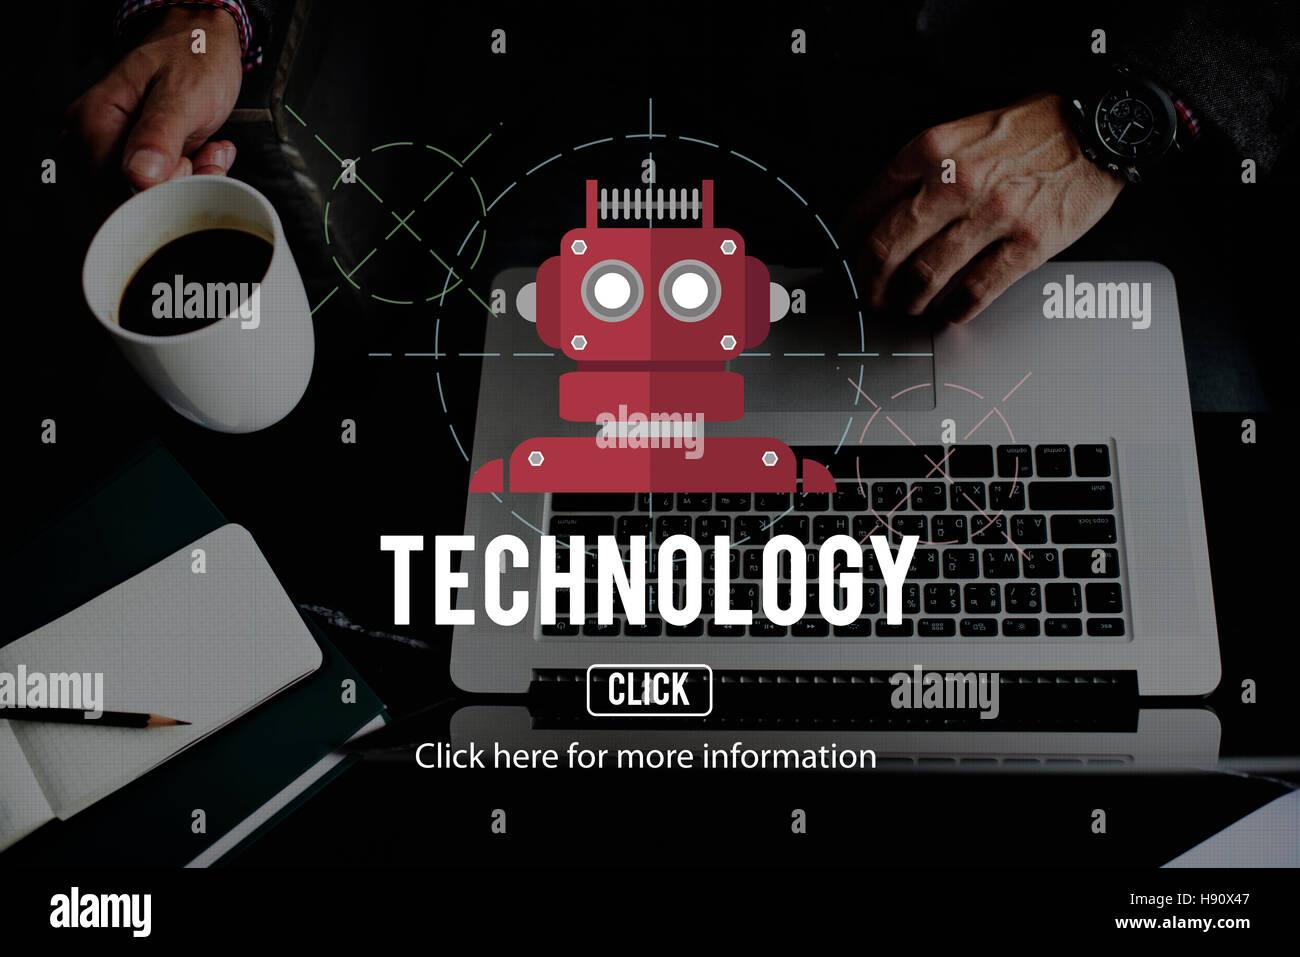 Robot Cyborg Ai Robotics Android Concept Stock Photo 126024983 Alamy